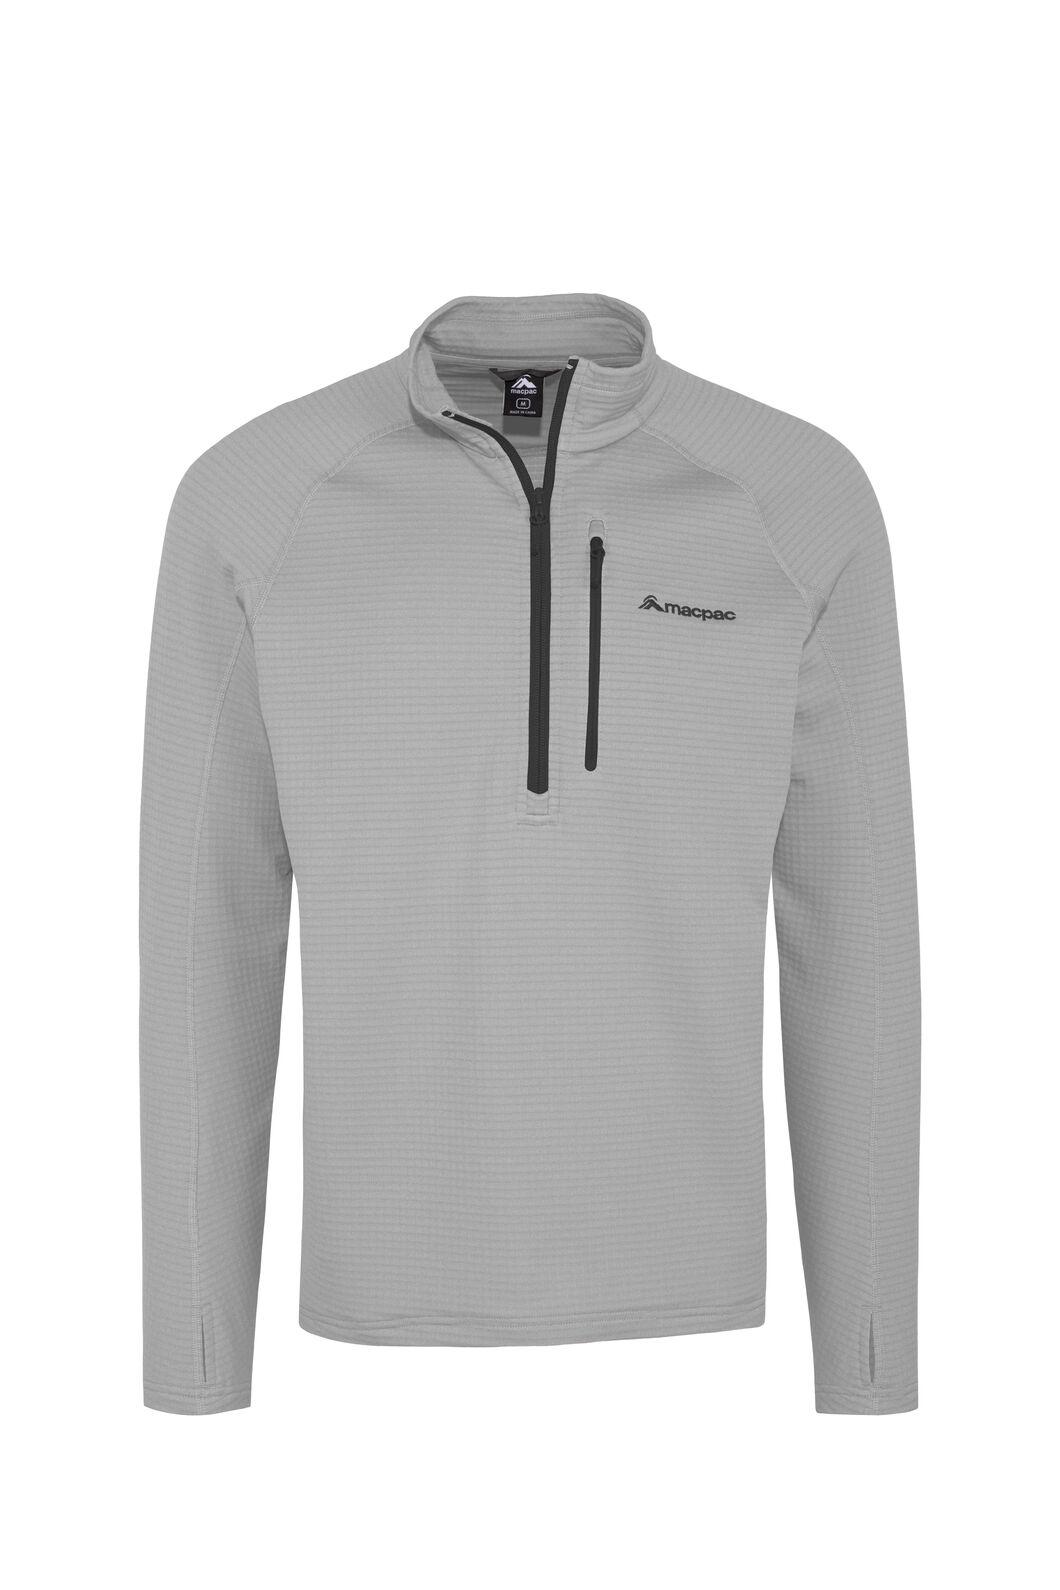 Macpac Ion Polartec® Fleece Half Zip Pullover — Men's, Alloy, hi-res